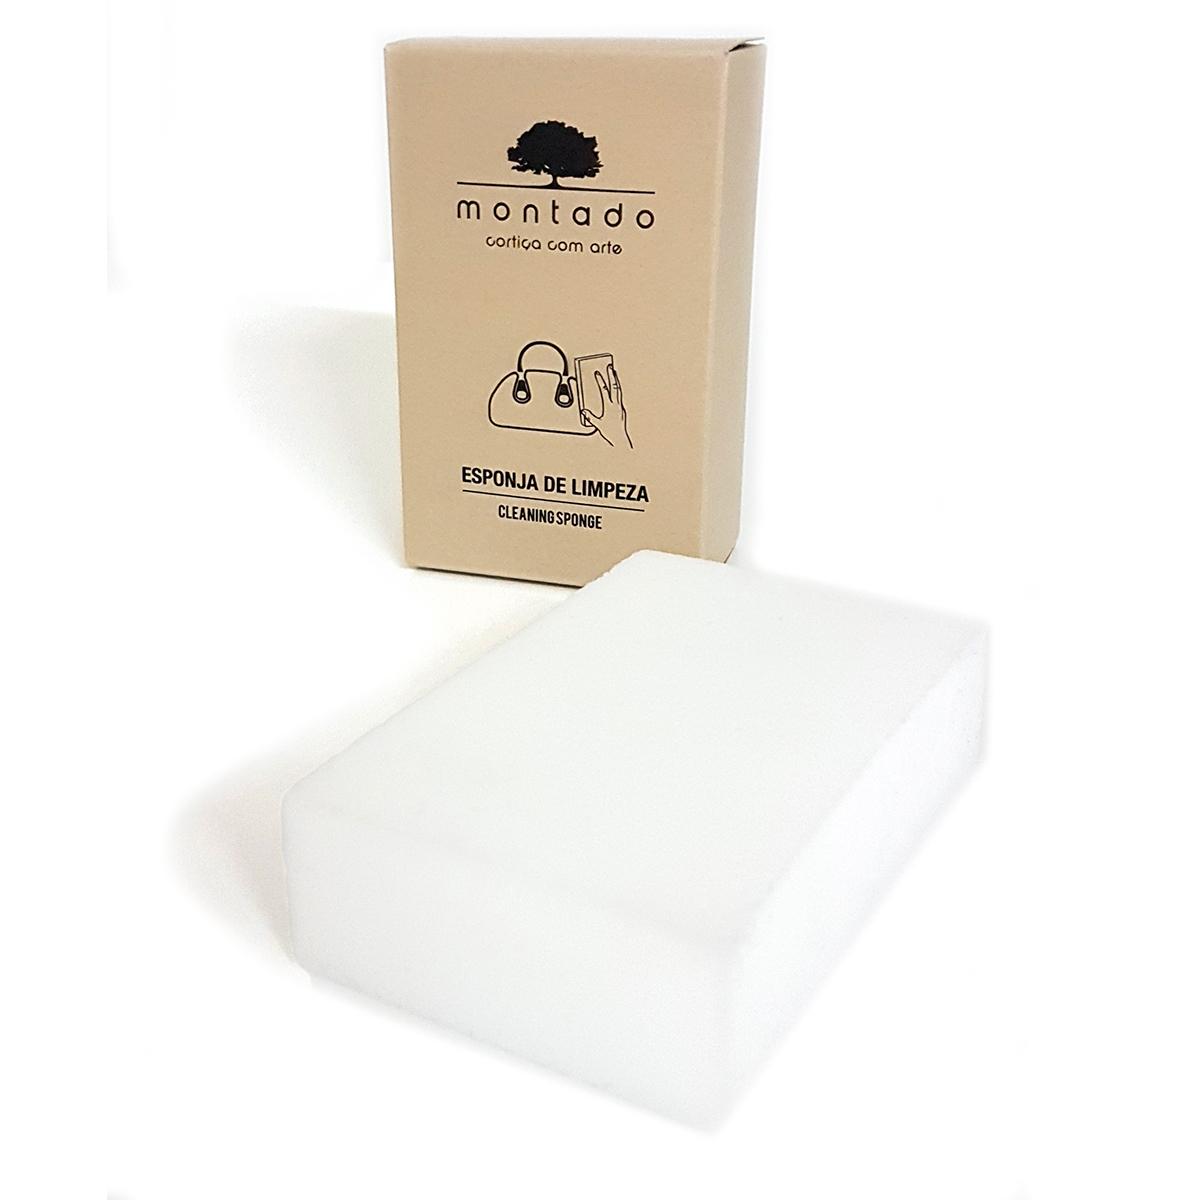 Esponja de Limpeza | Montado